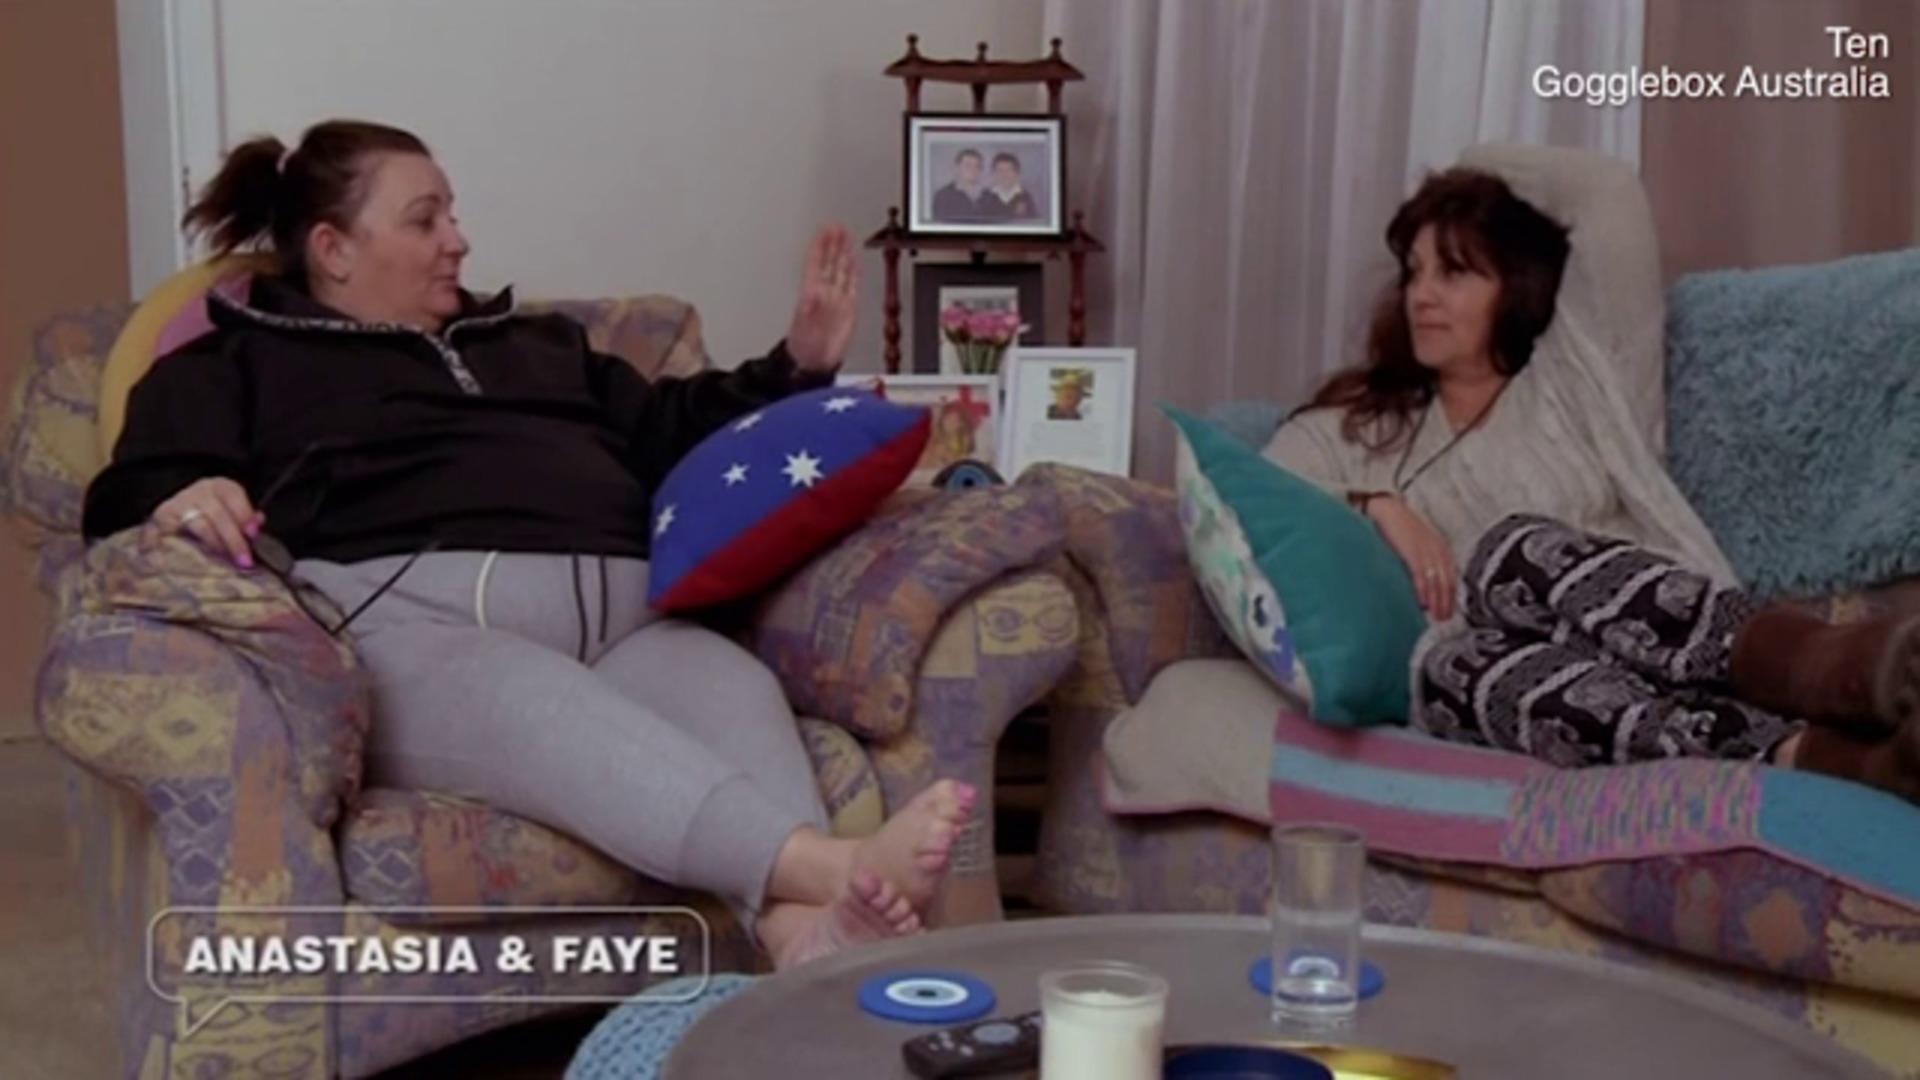 Gogglebox's Anastasia Katselas reveals she's living with her man